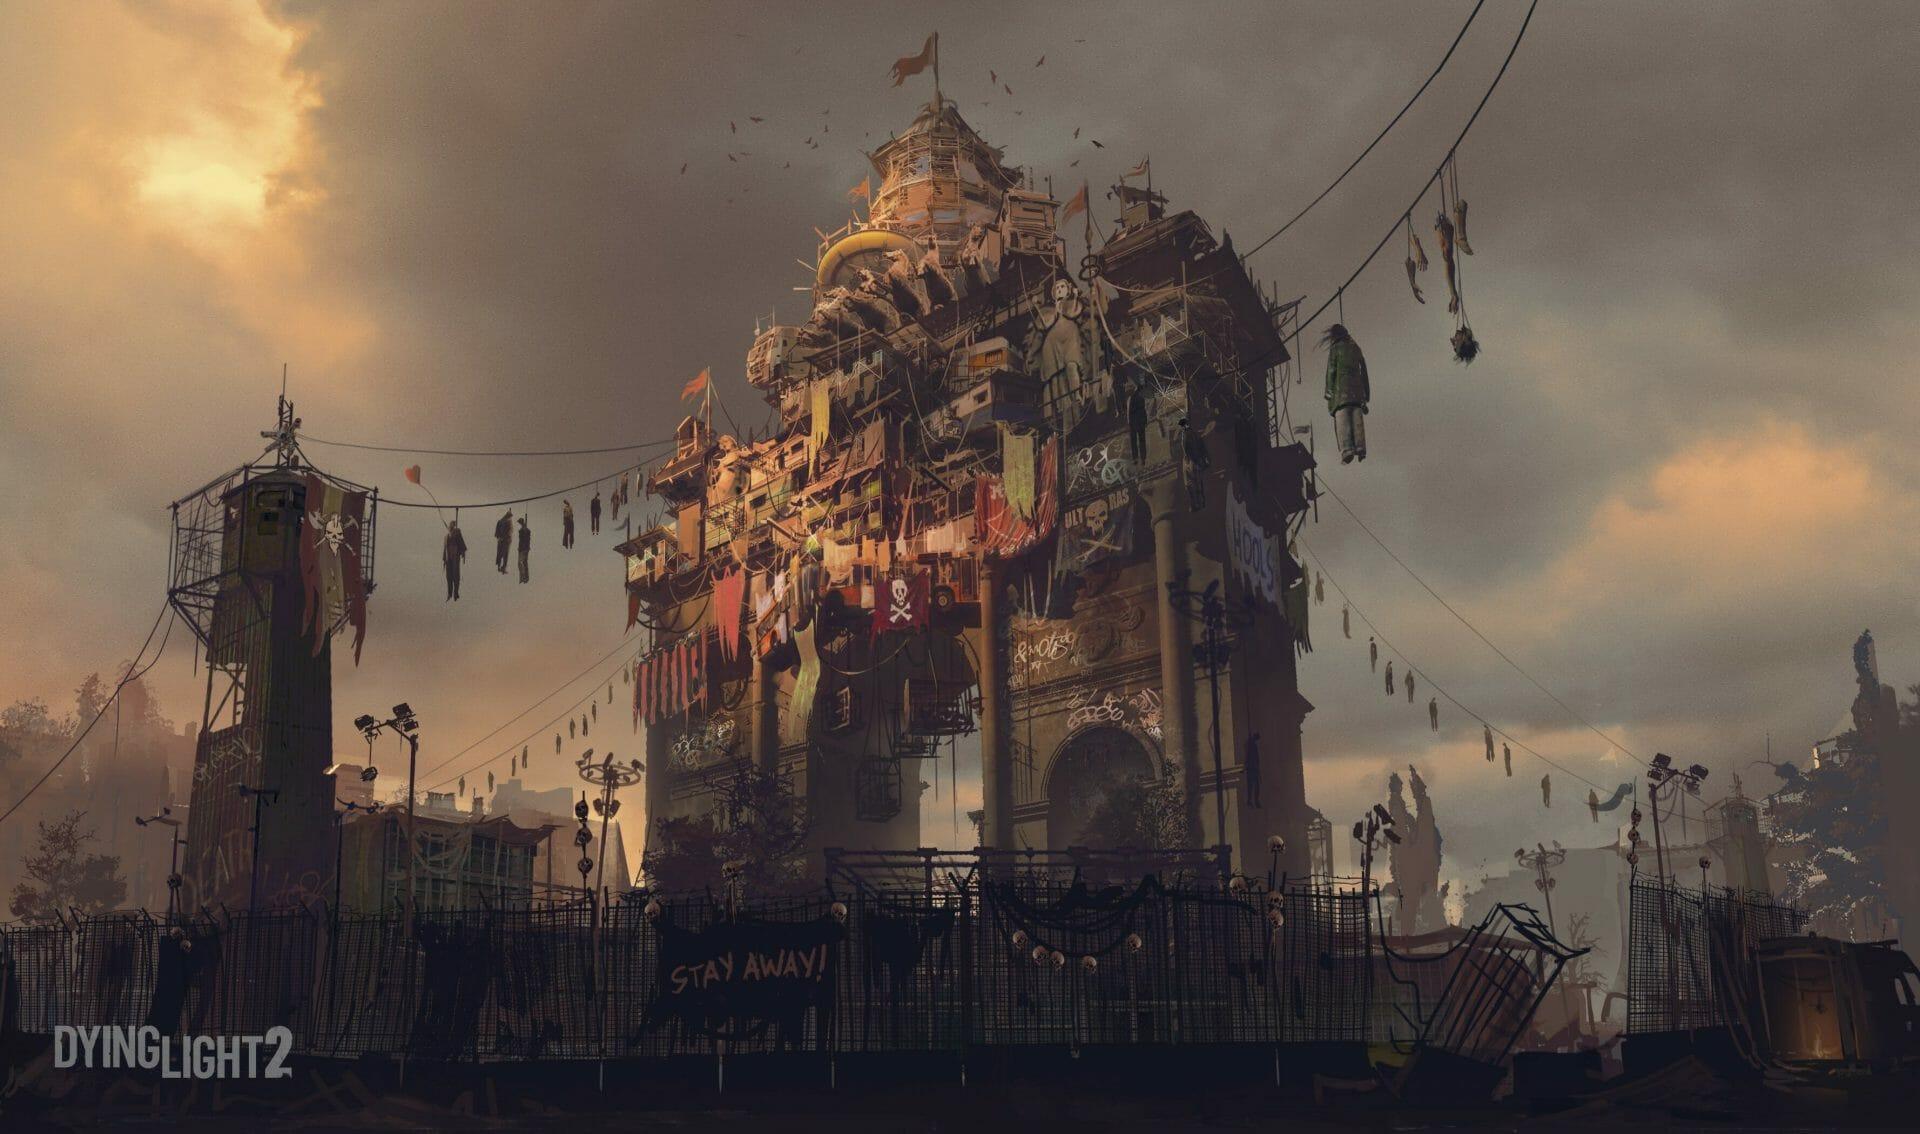 Dying Light 2 concept art